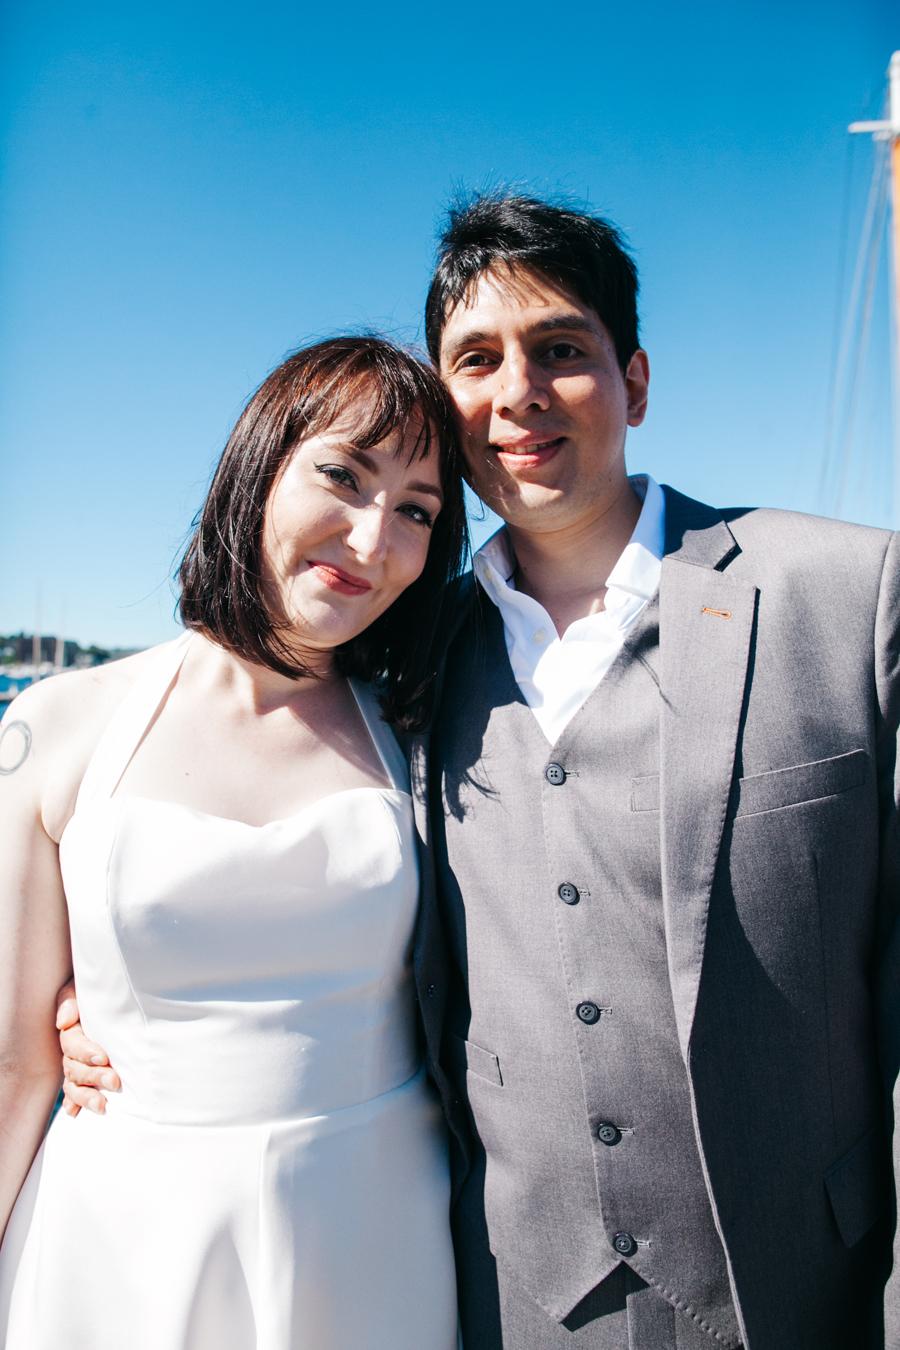 015-center-for-wooden-boats-seattle-washington-wedding-katheryn-moran-photography.jpg